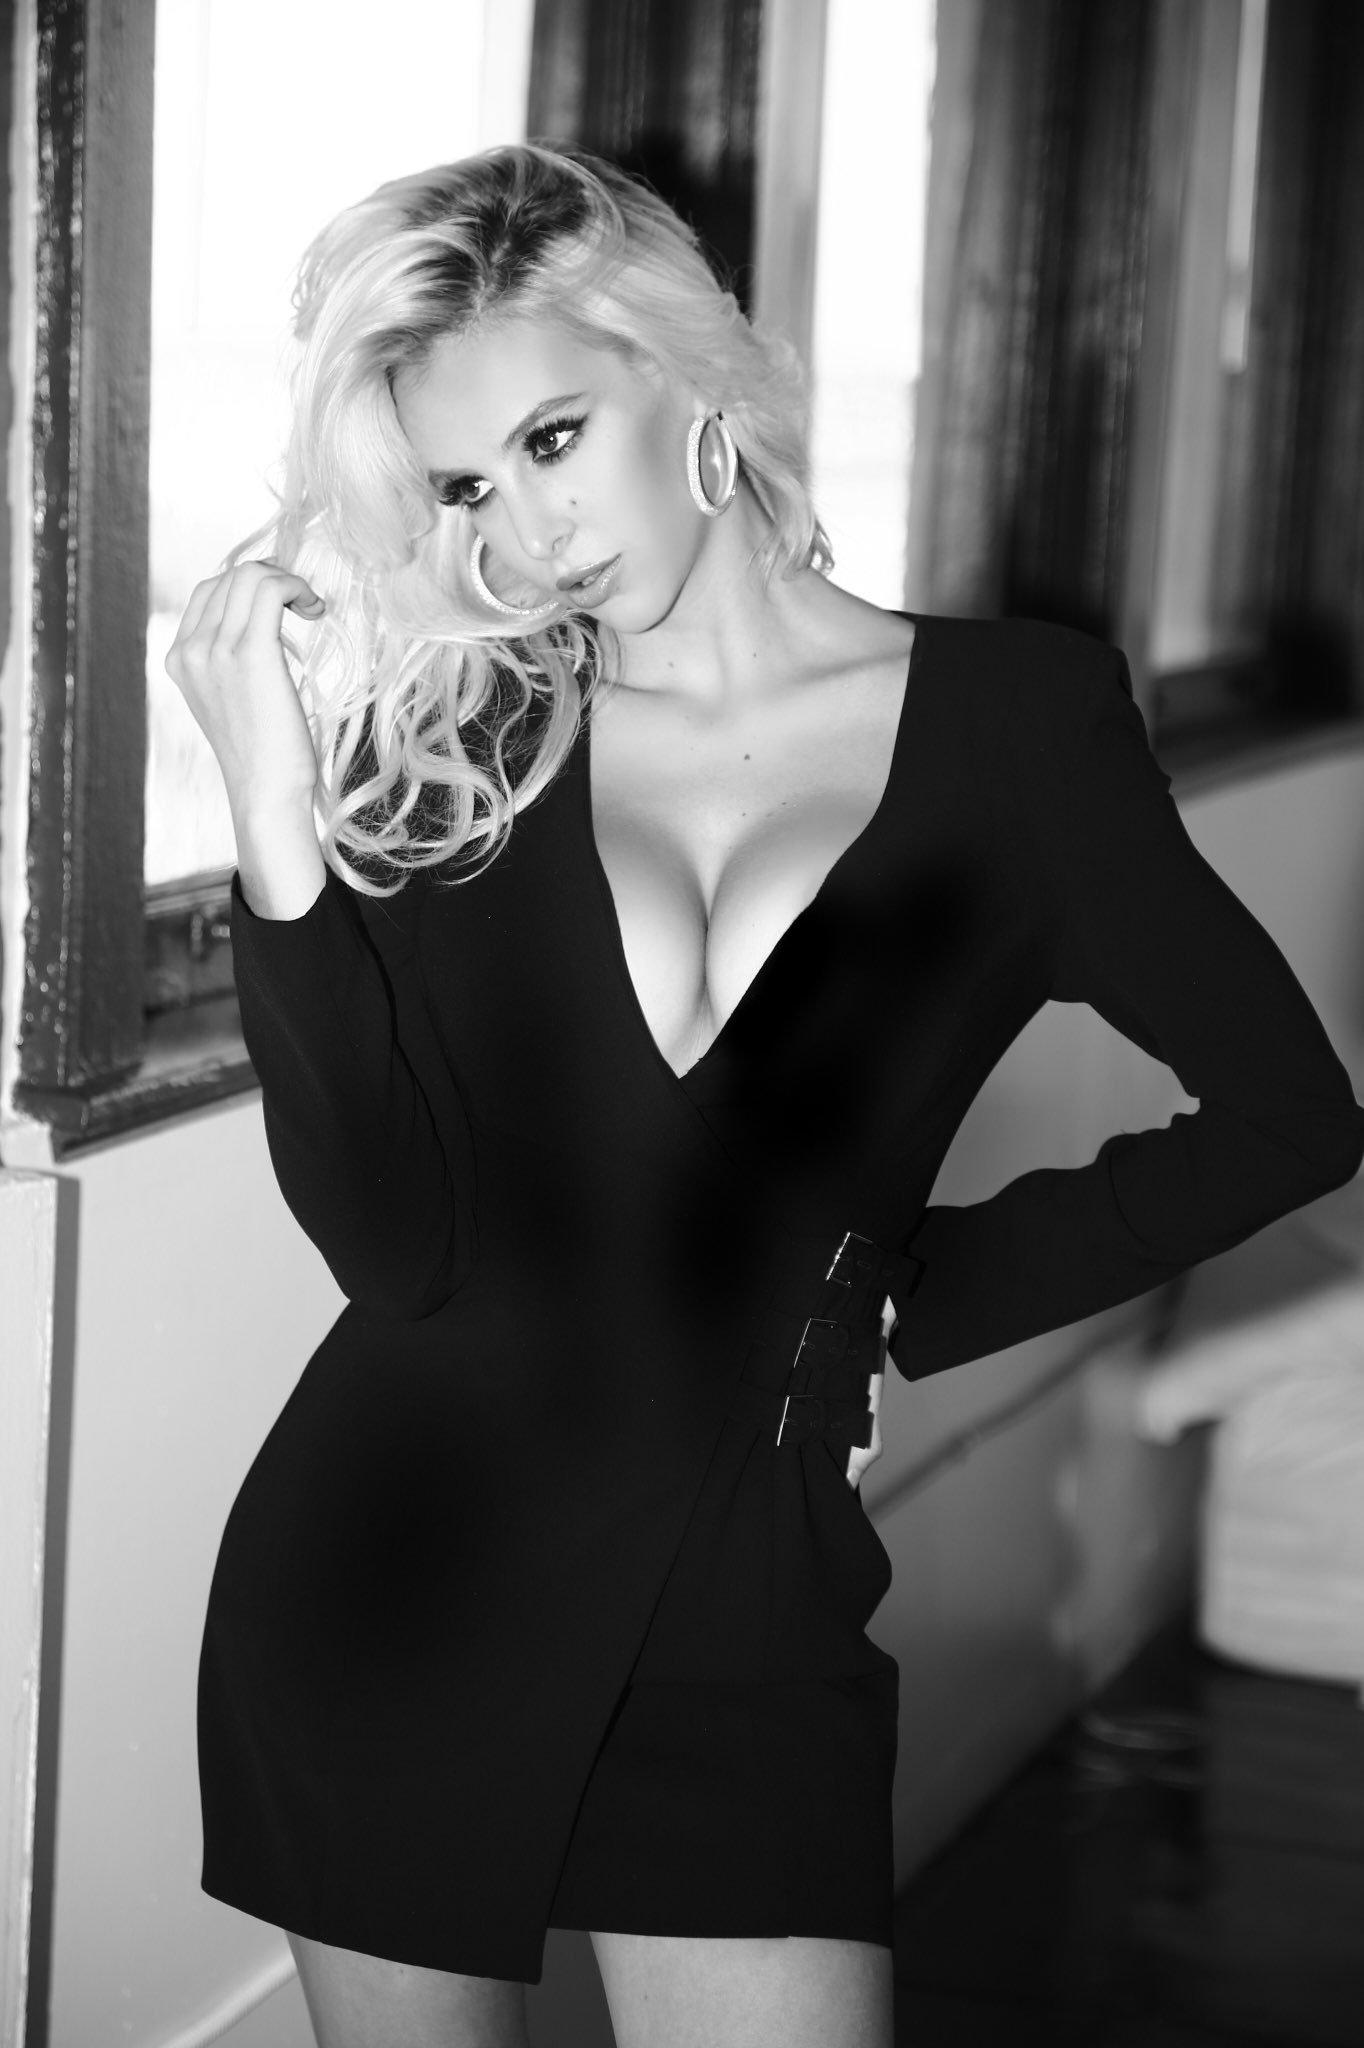 Cleavage Bri Teresi nude (82 photo), Tits, Bikini, Twitter, lingerie 2015